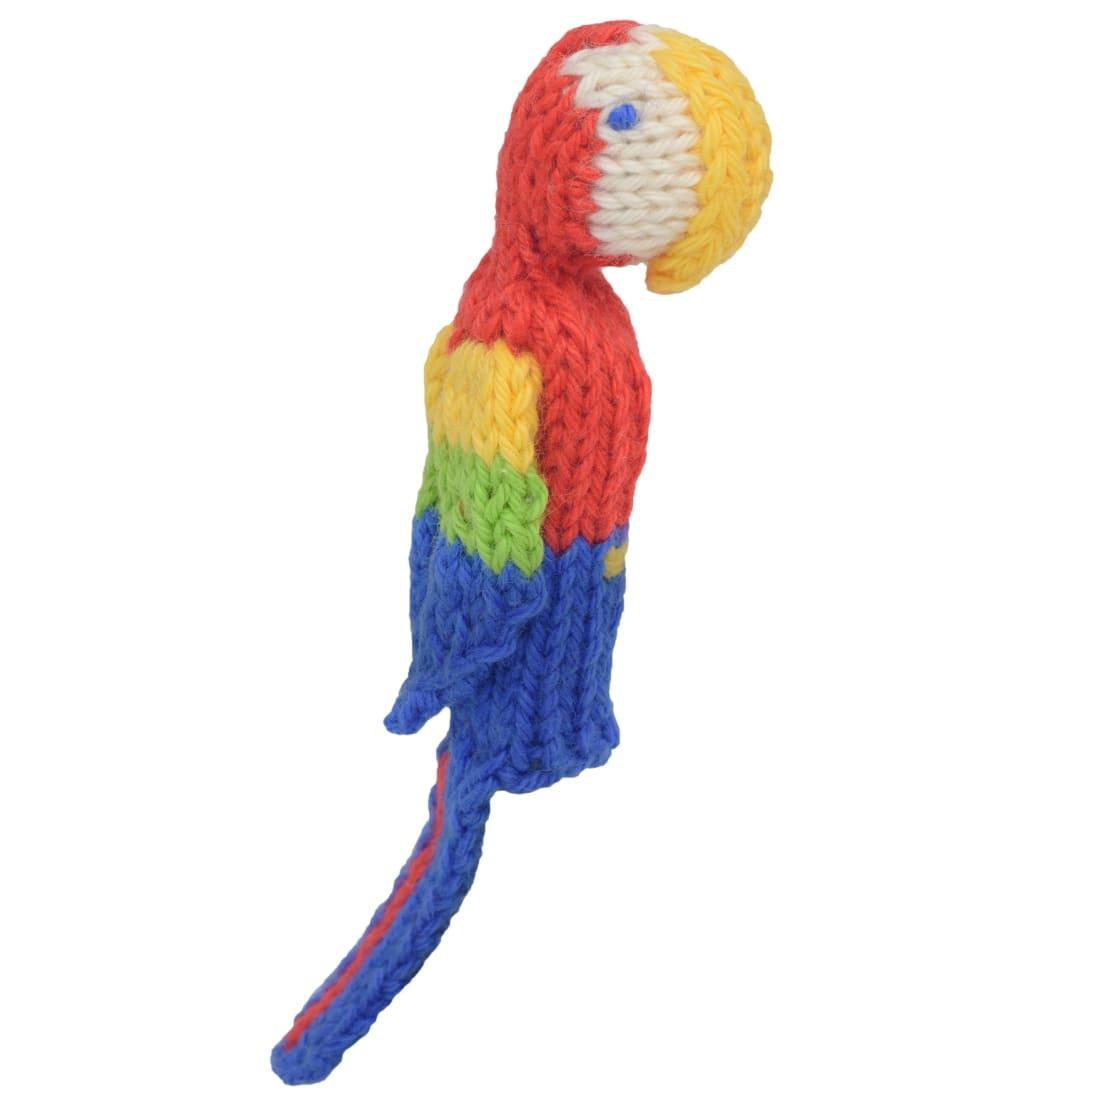 UKP072B Macaw